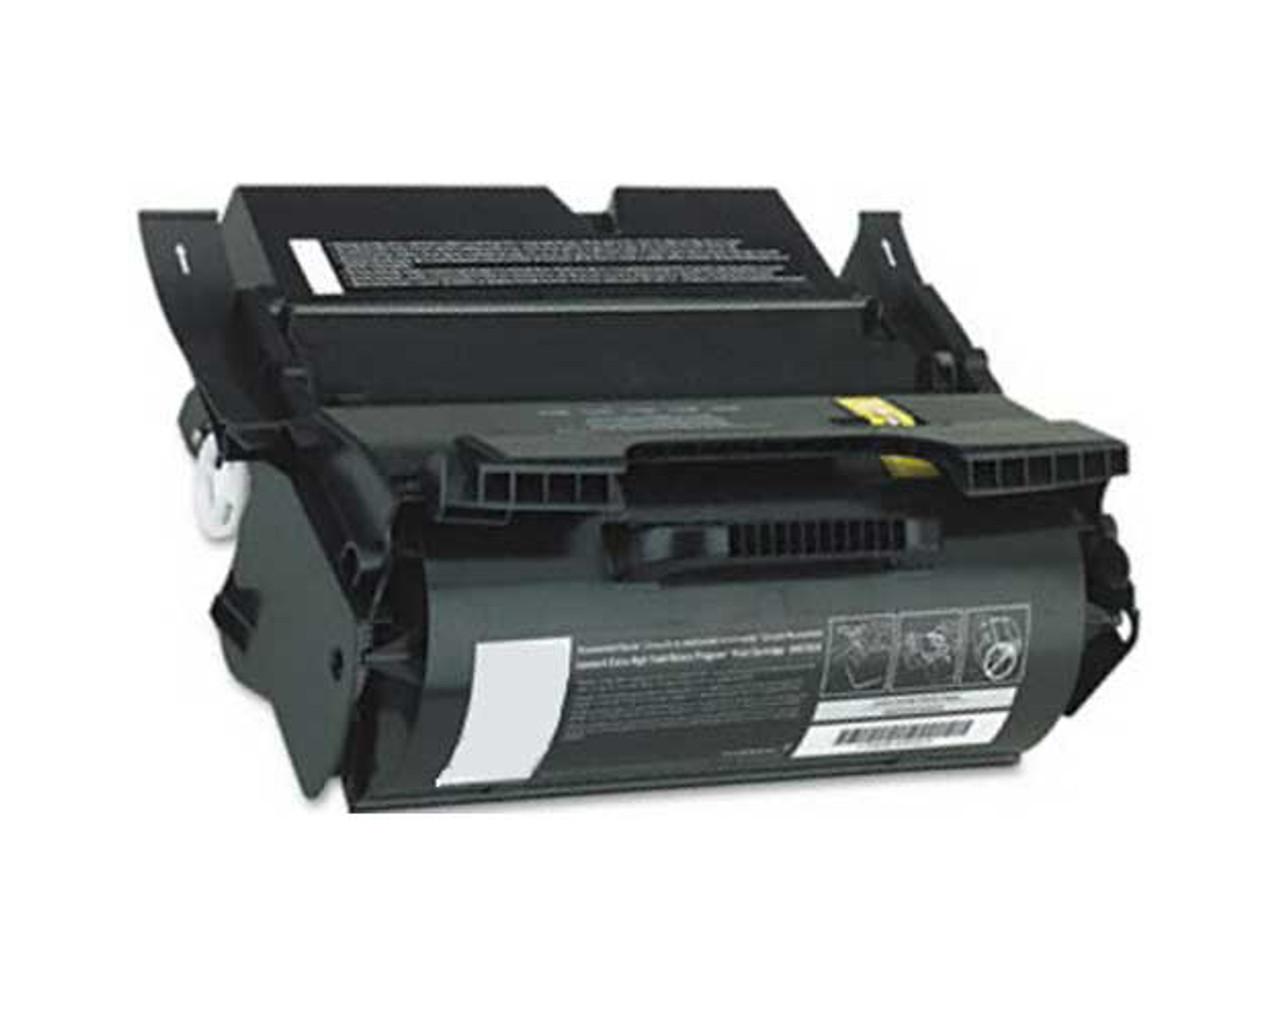 Lexmark MX810/MX811 High Yield Toner Cartridge - New